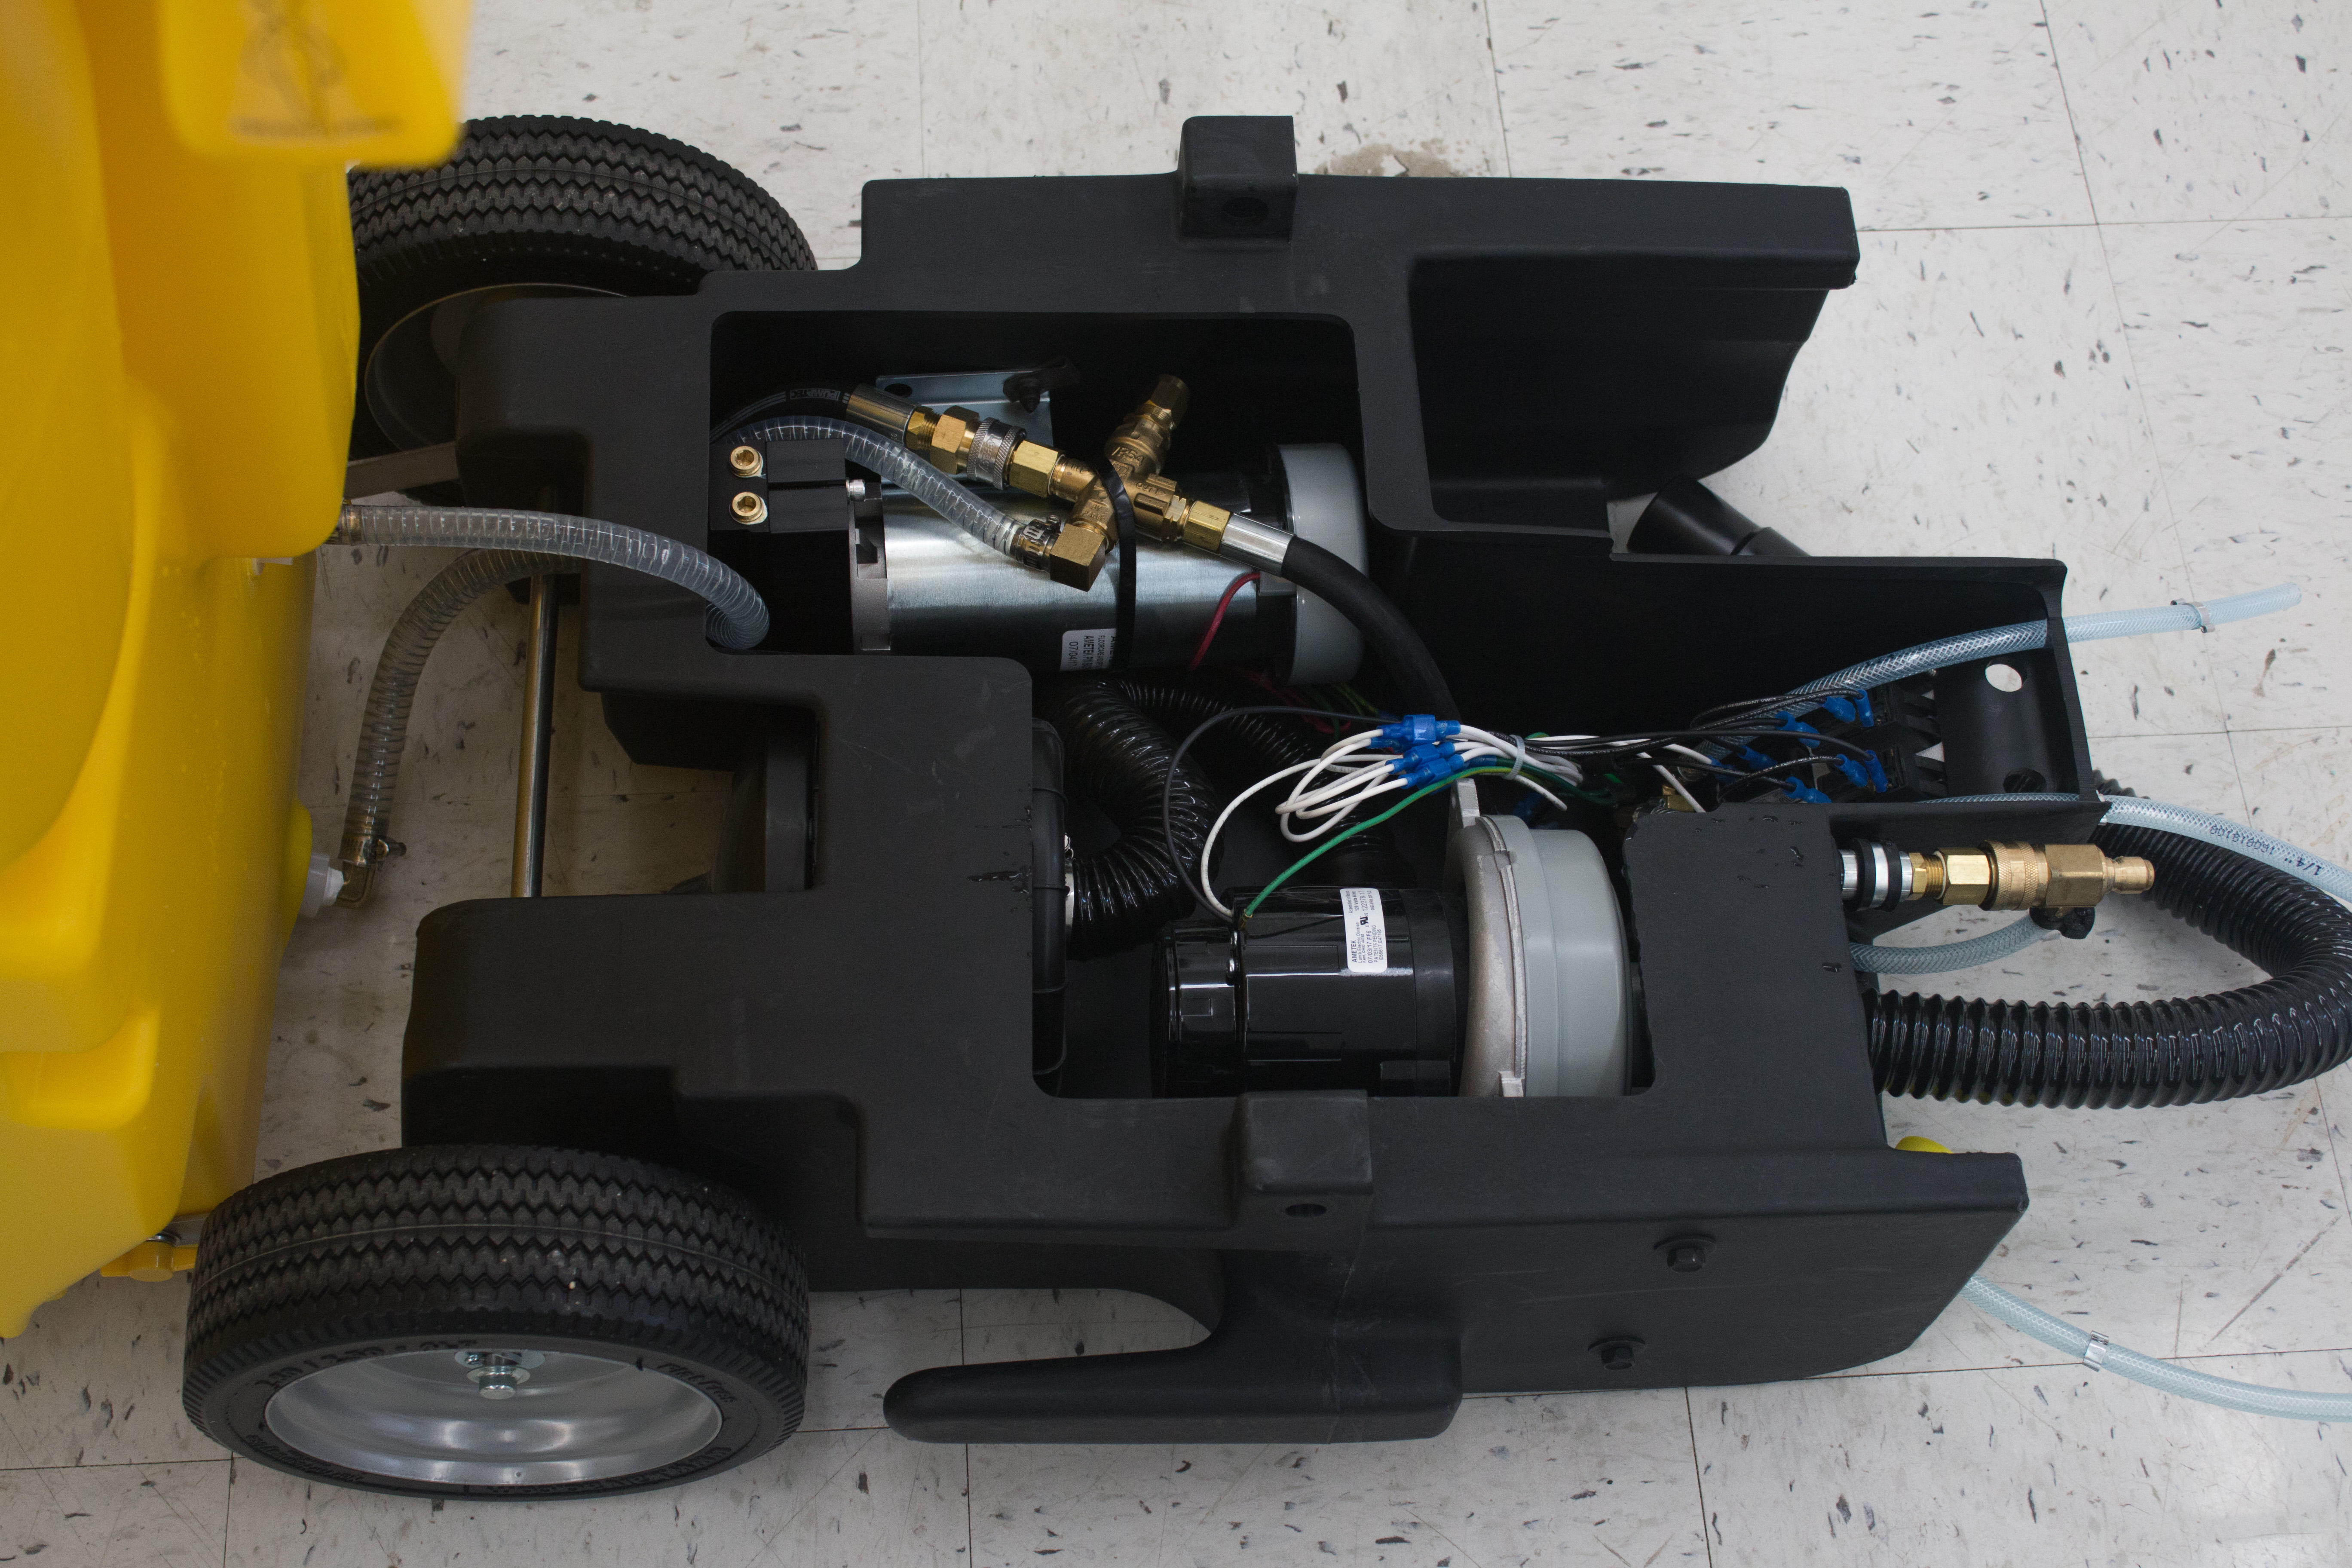 Kaivac Black Box on NTC System